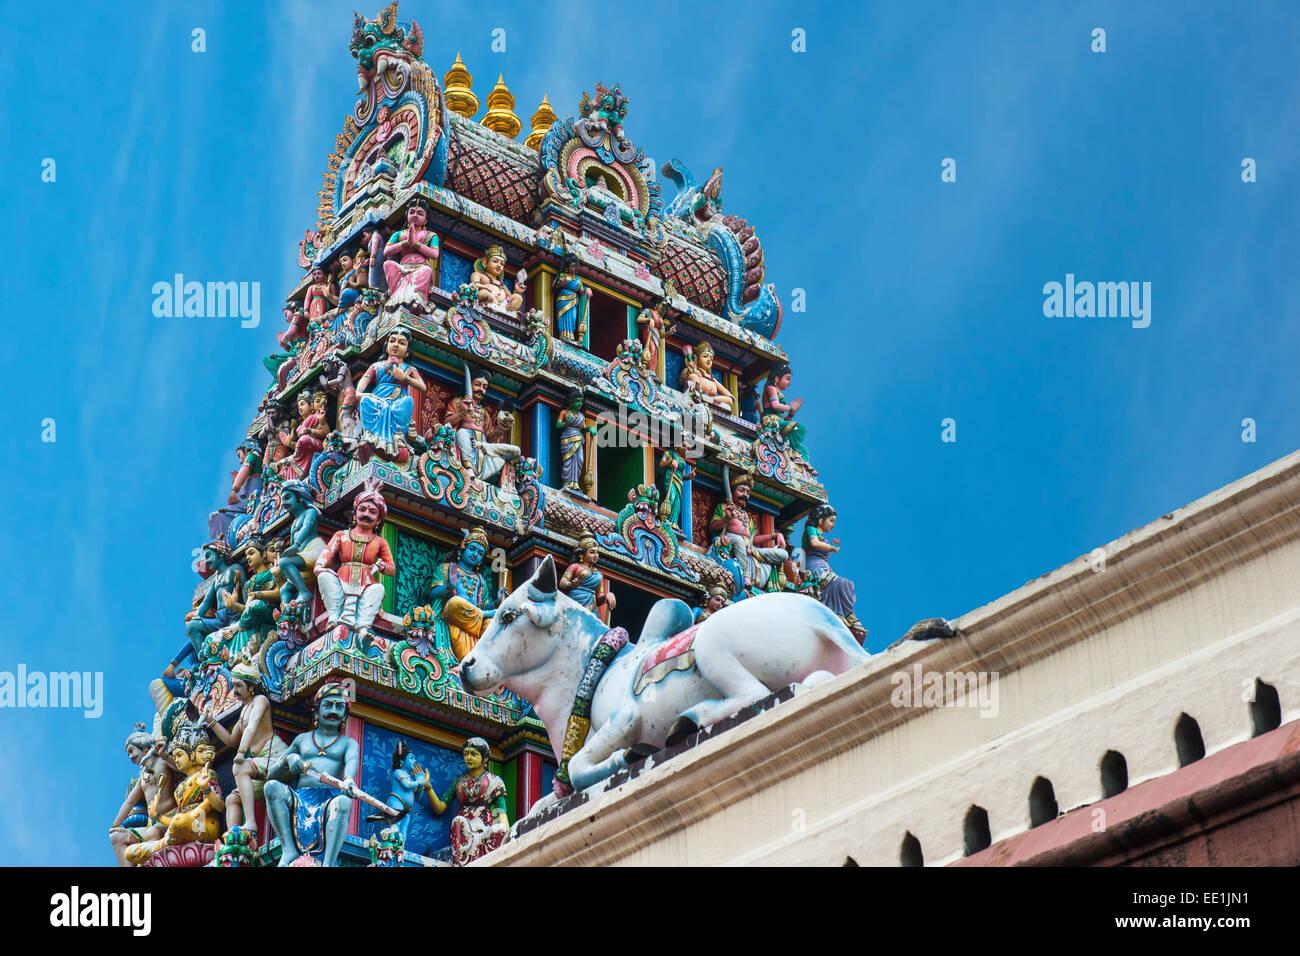 Hindu deities at Sri Mariamman (Mother Goddess Temple), oldest Hindu place of worship, Chinatown, Singapore, Asia - Stock Image